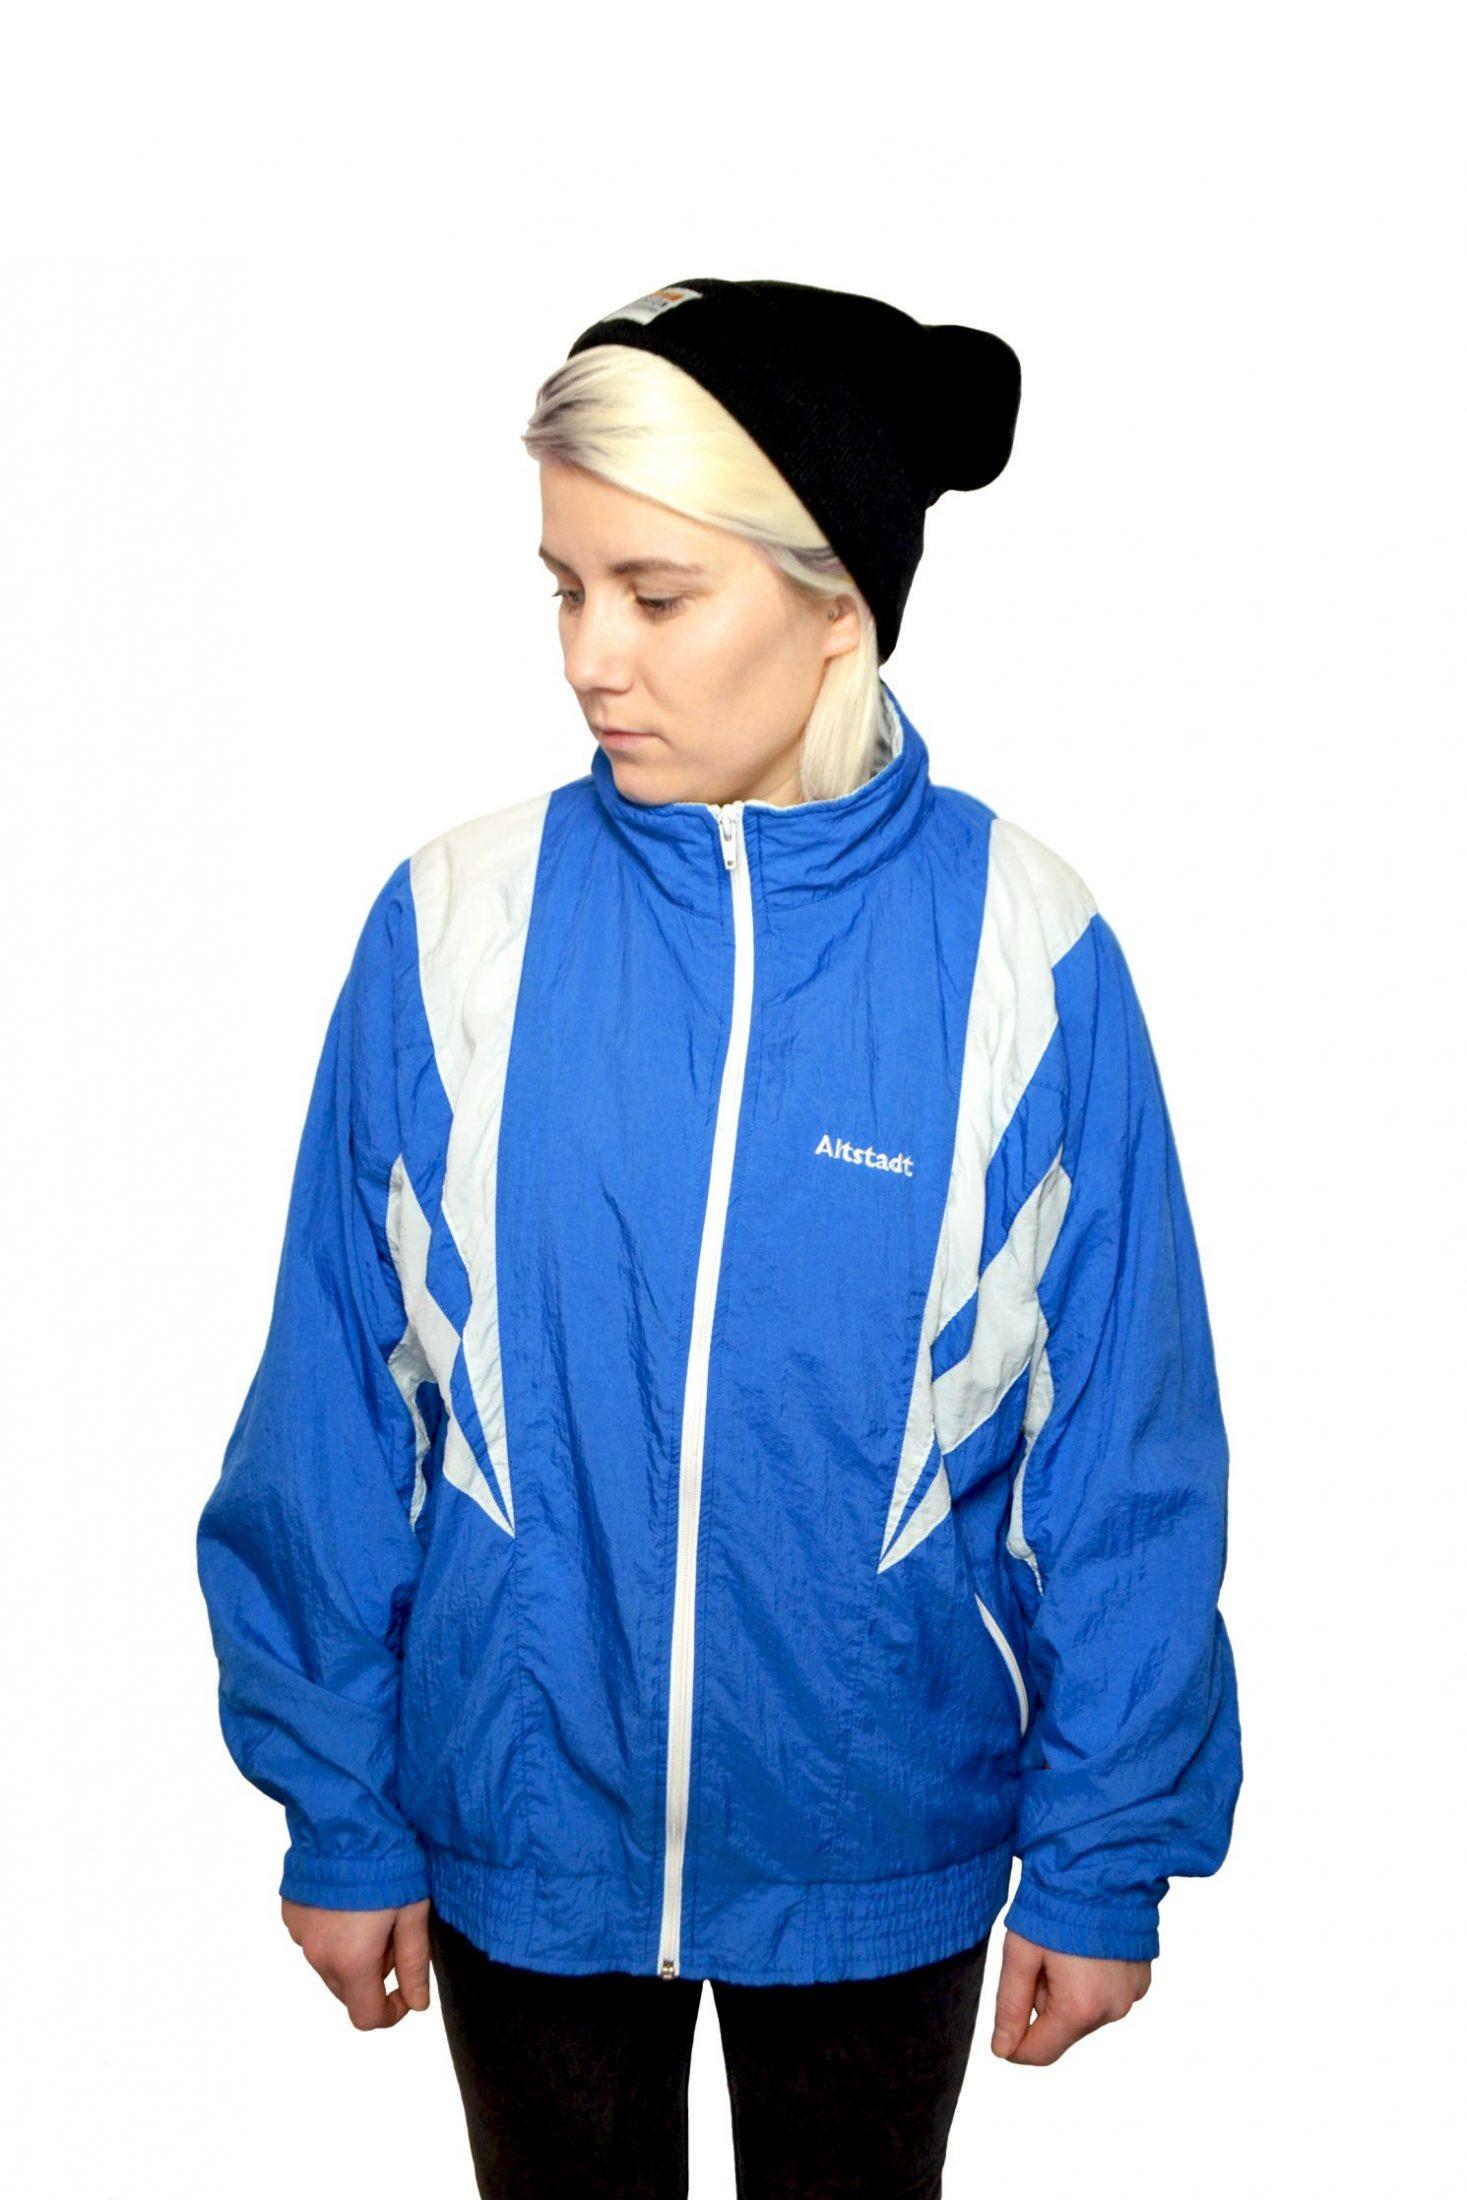 vintage sport jacket milk vintage clothing